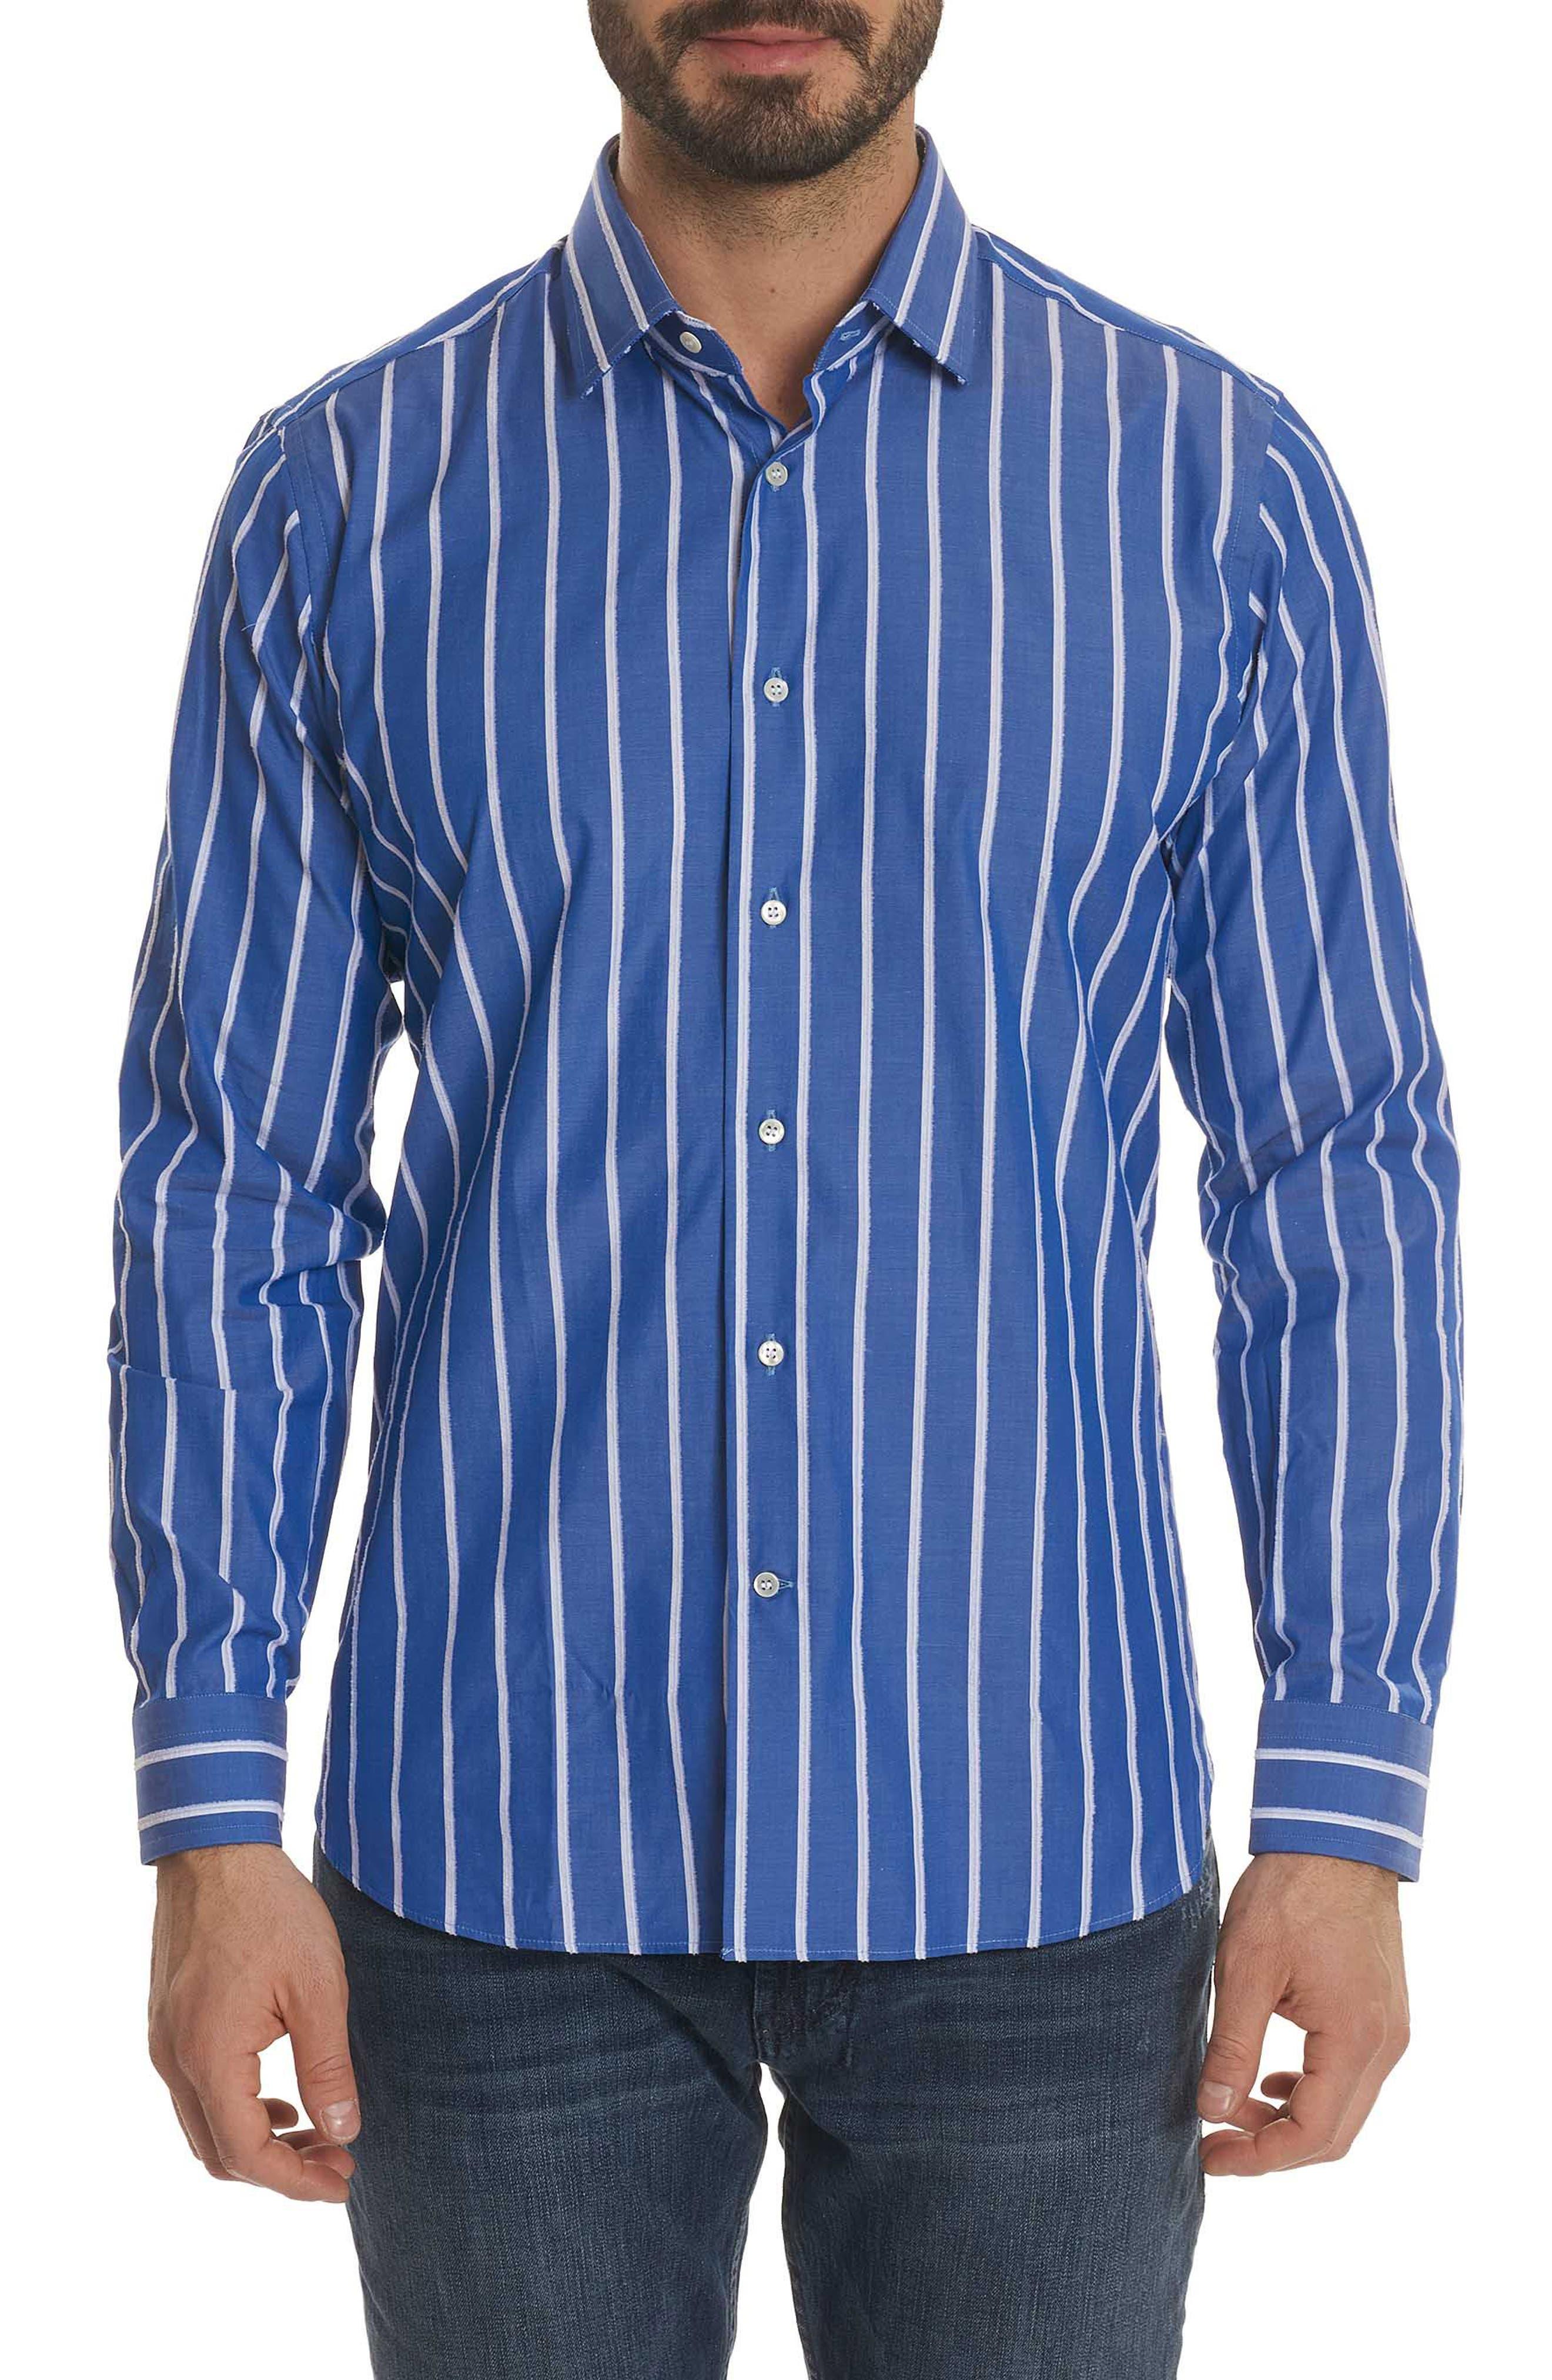 Massimo Regular Fit Stripe Sport Shirt,                         Main,                         color, Blue